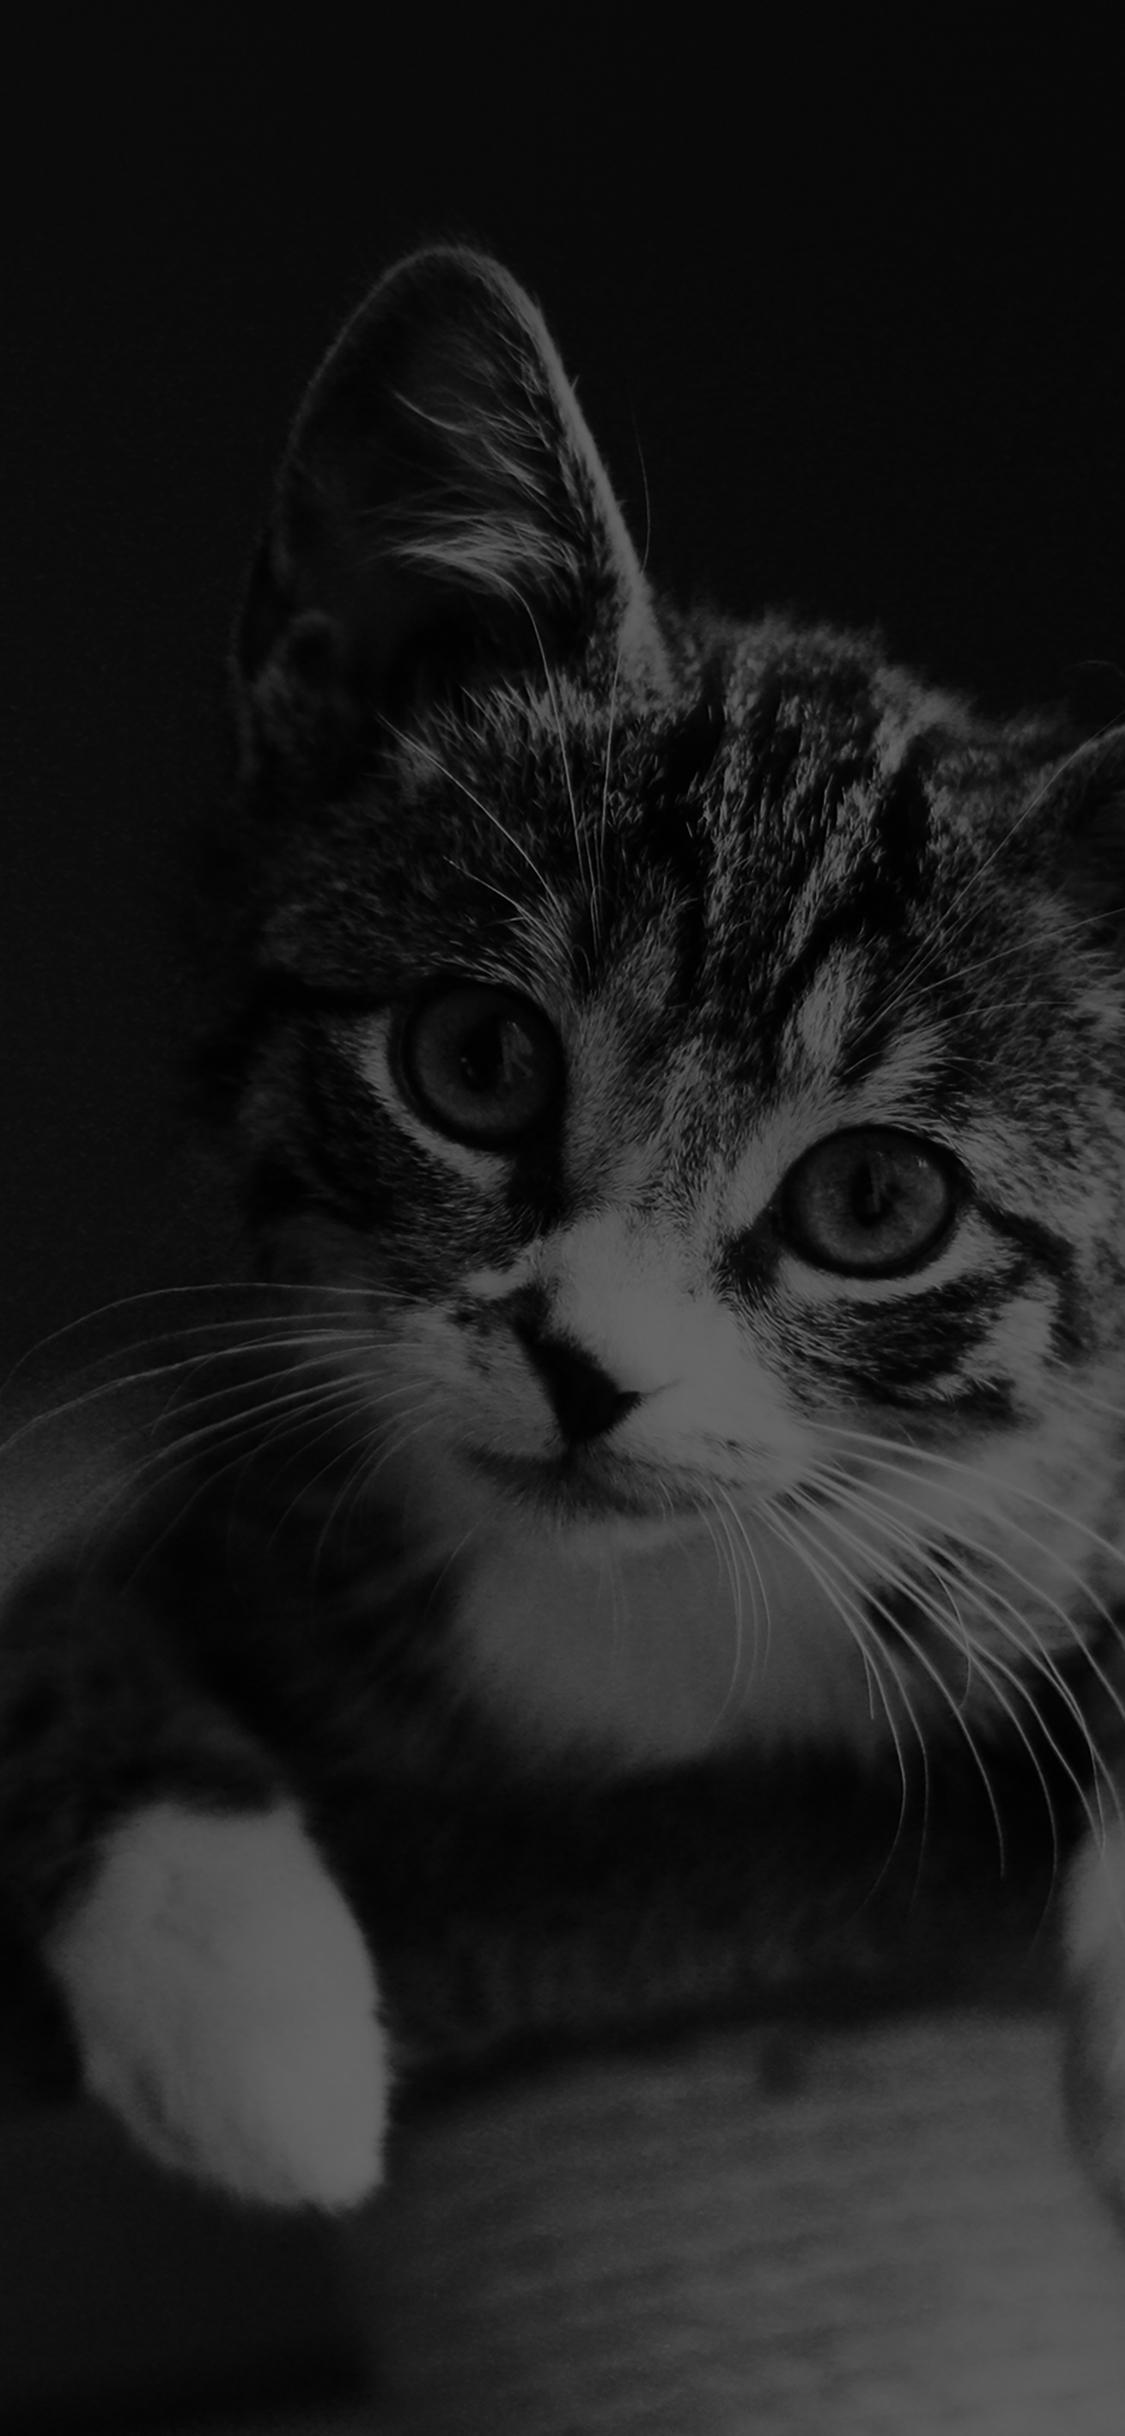 mi36-cute-cat-look-dark-bw-animal-love-nature-wallpaper